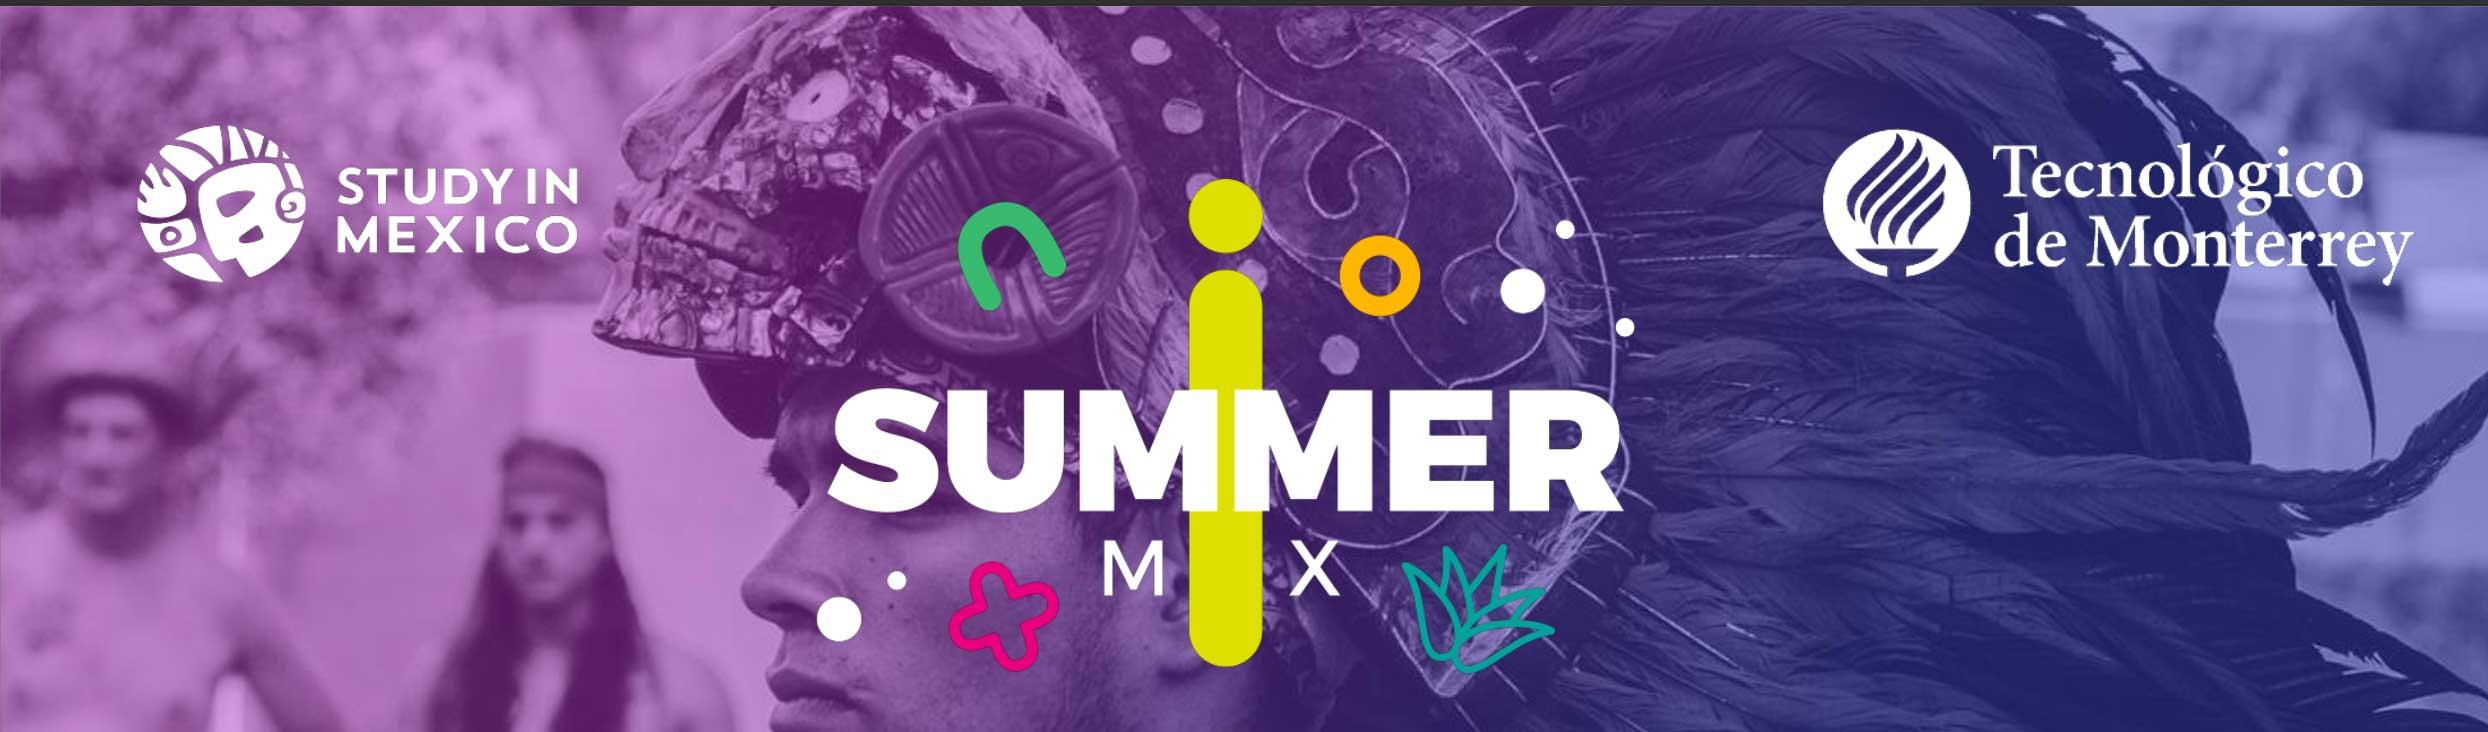 i Summer MX – Apply now!